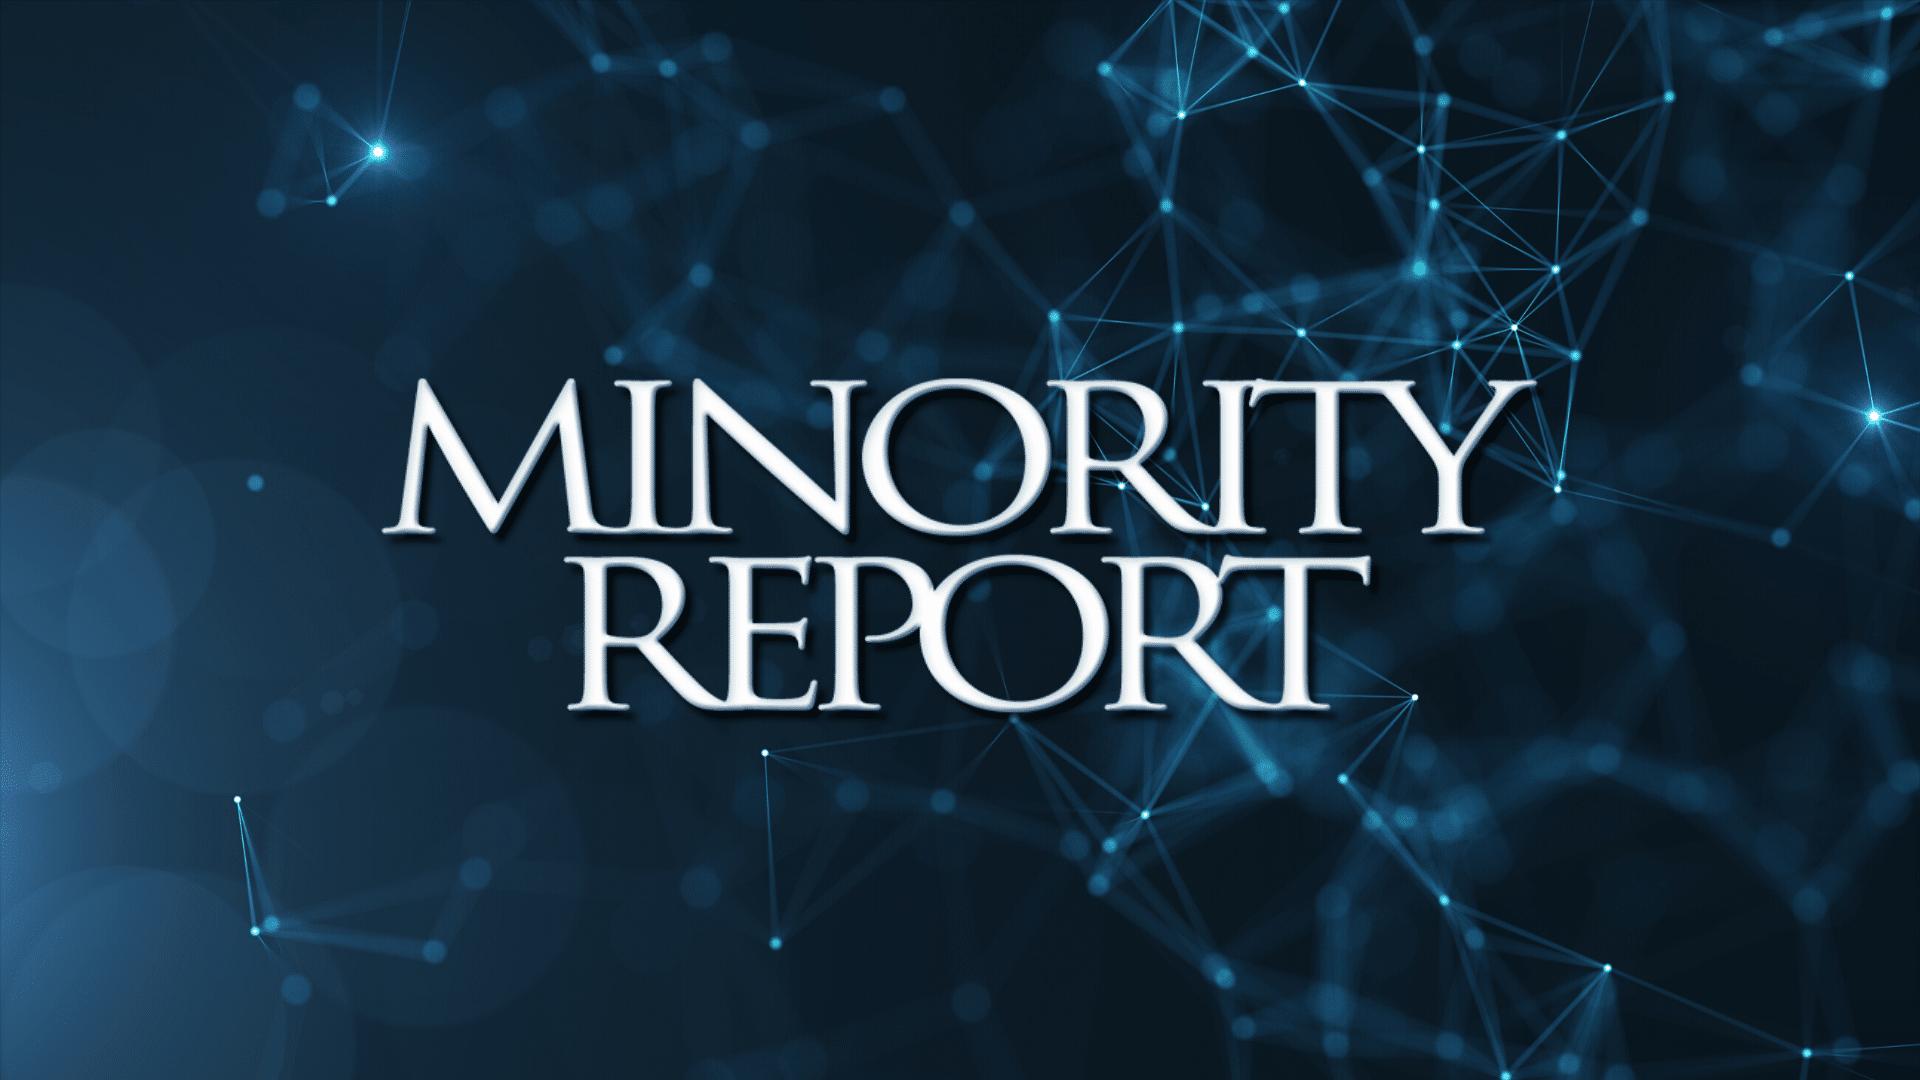 #DataScienceFiction: Minority Report